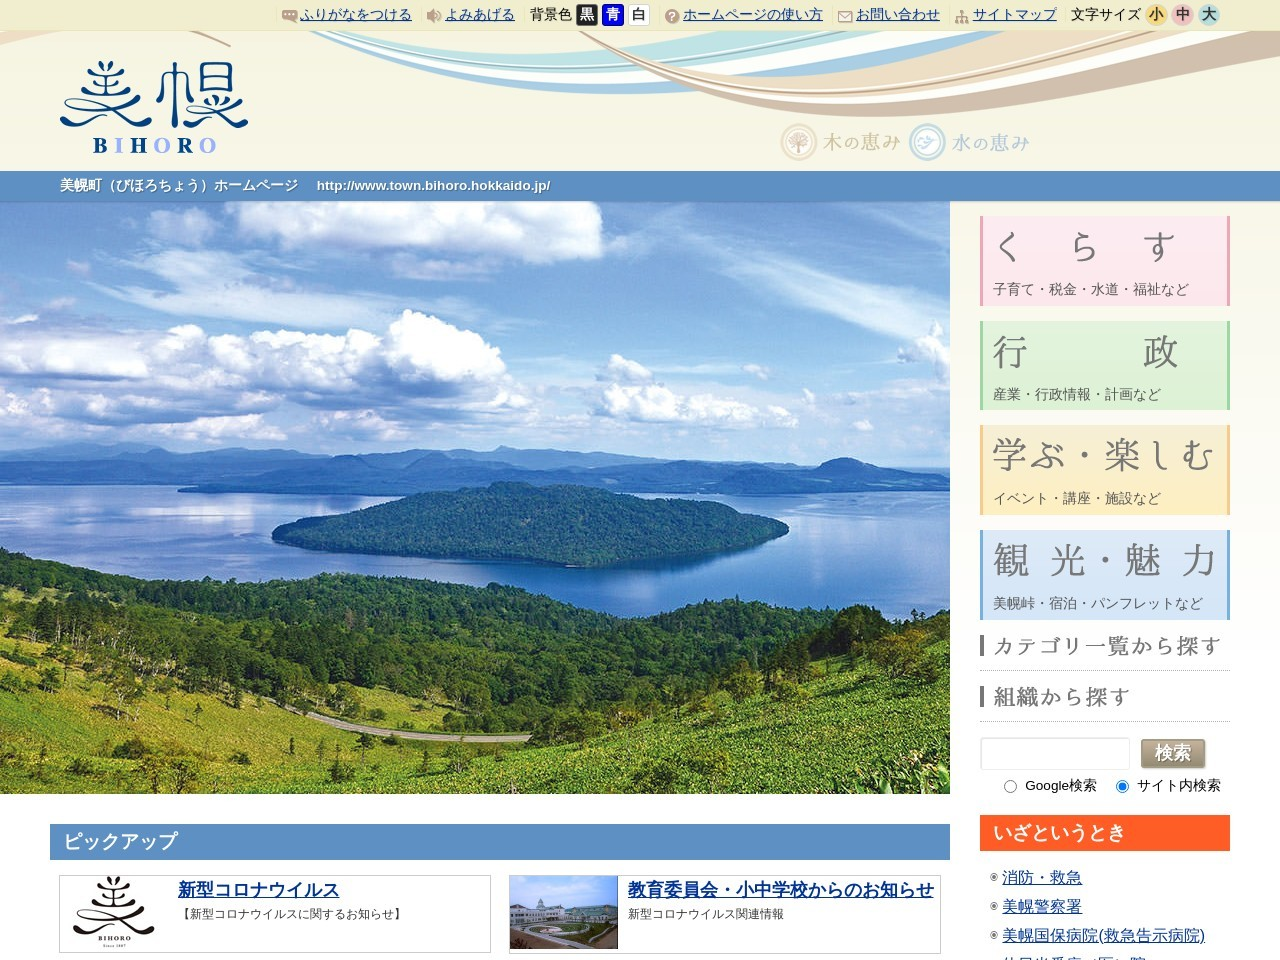 http://www.town.bihoro.hokkaido.jp/docs/2018102200066/